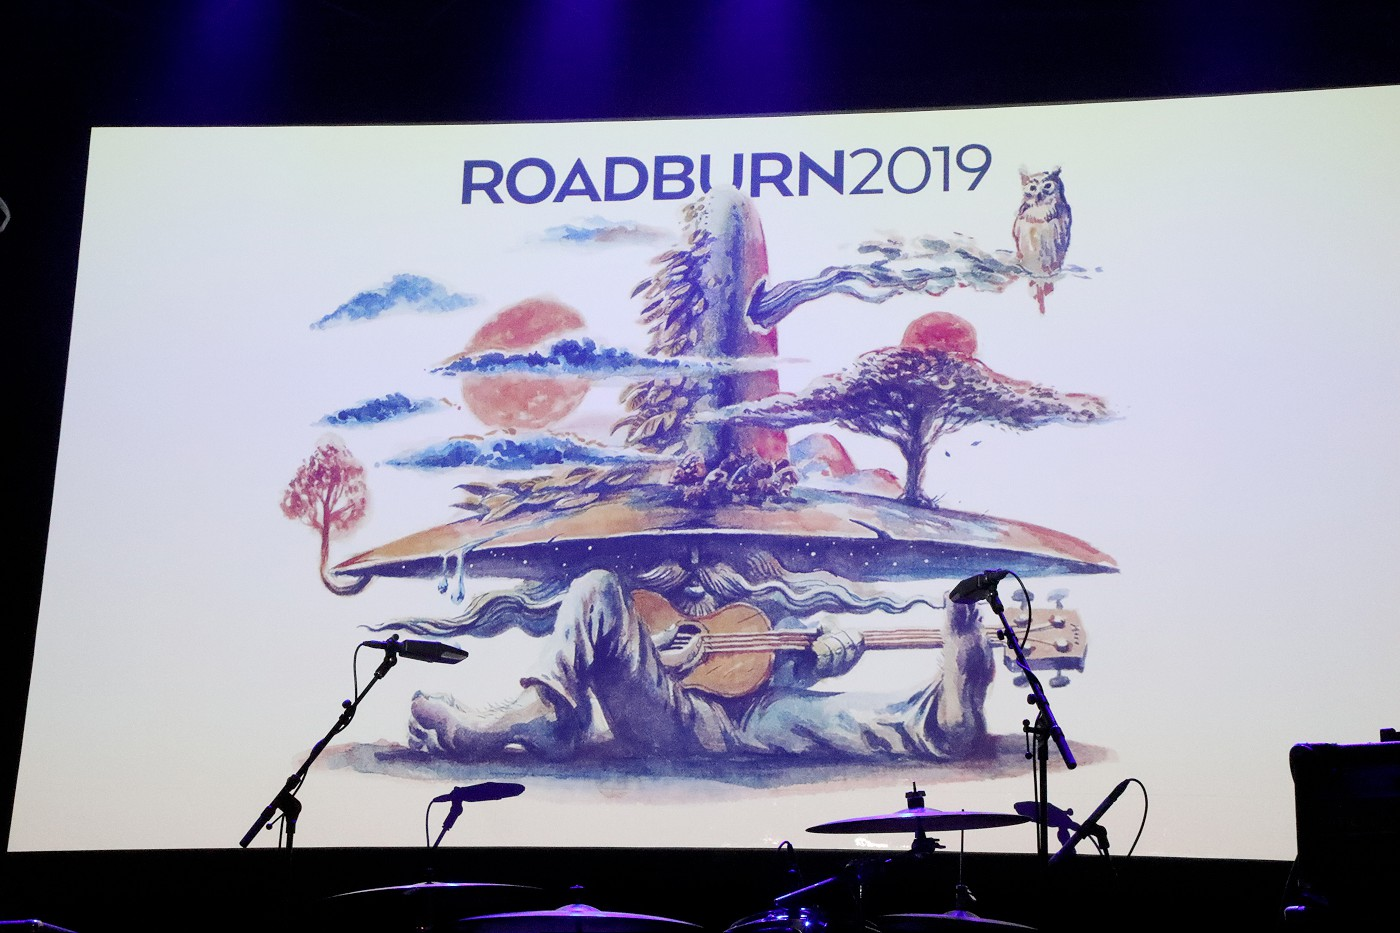 roadburn 2019 banner (Photo by JJ Koczan)